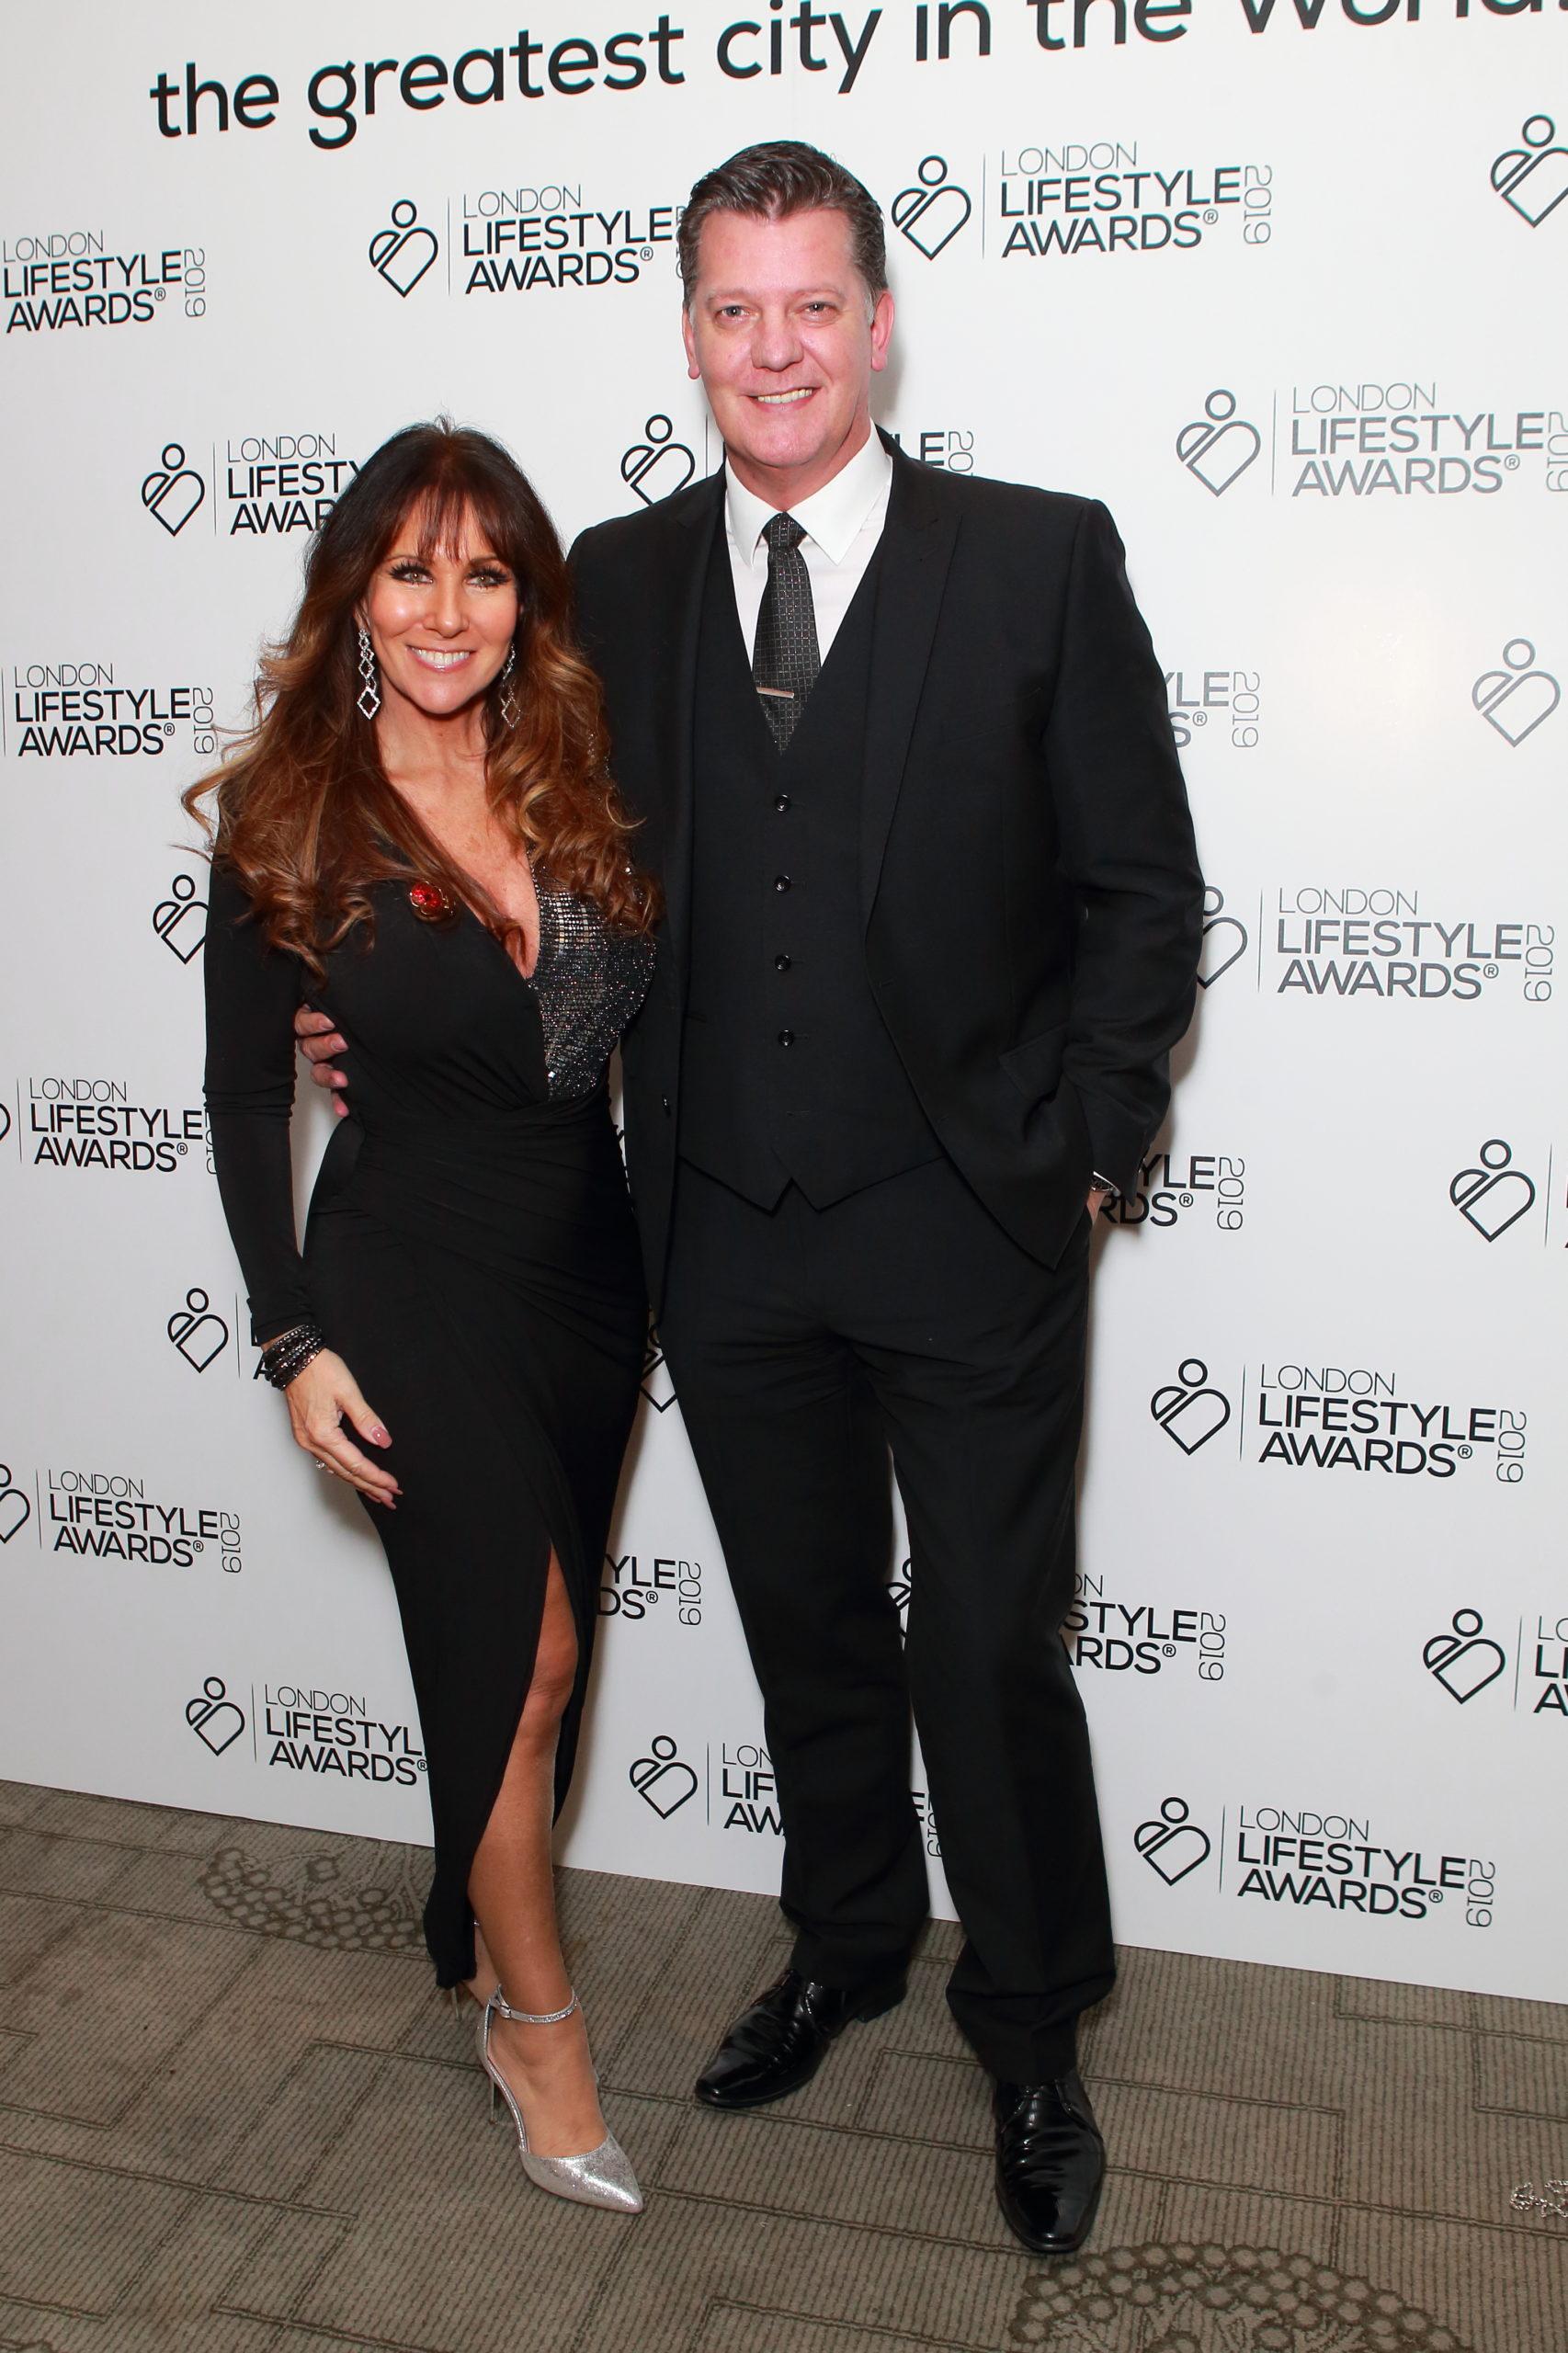 Linda Lusardi and husband Sam